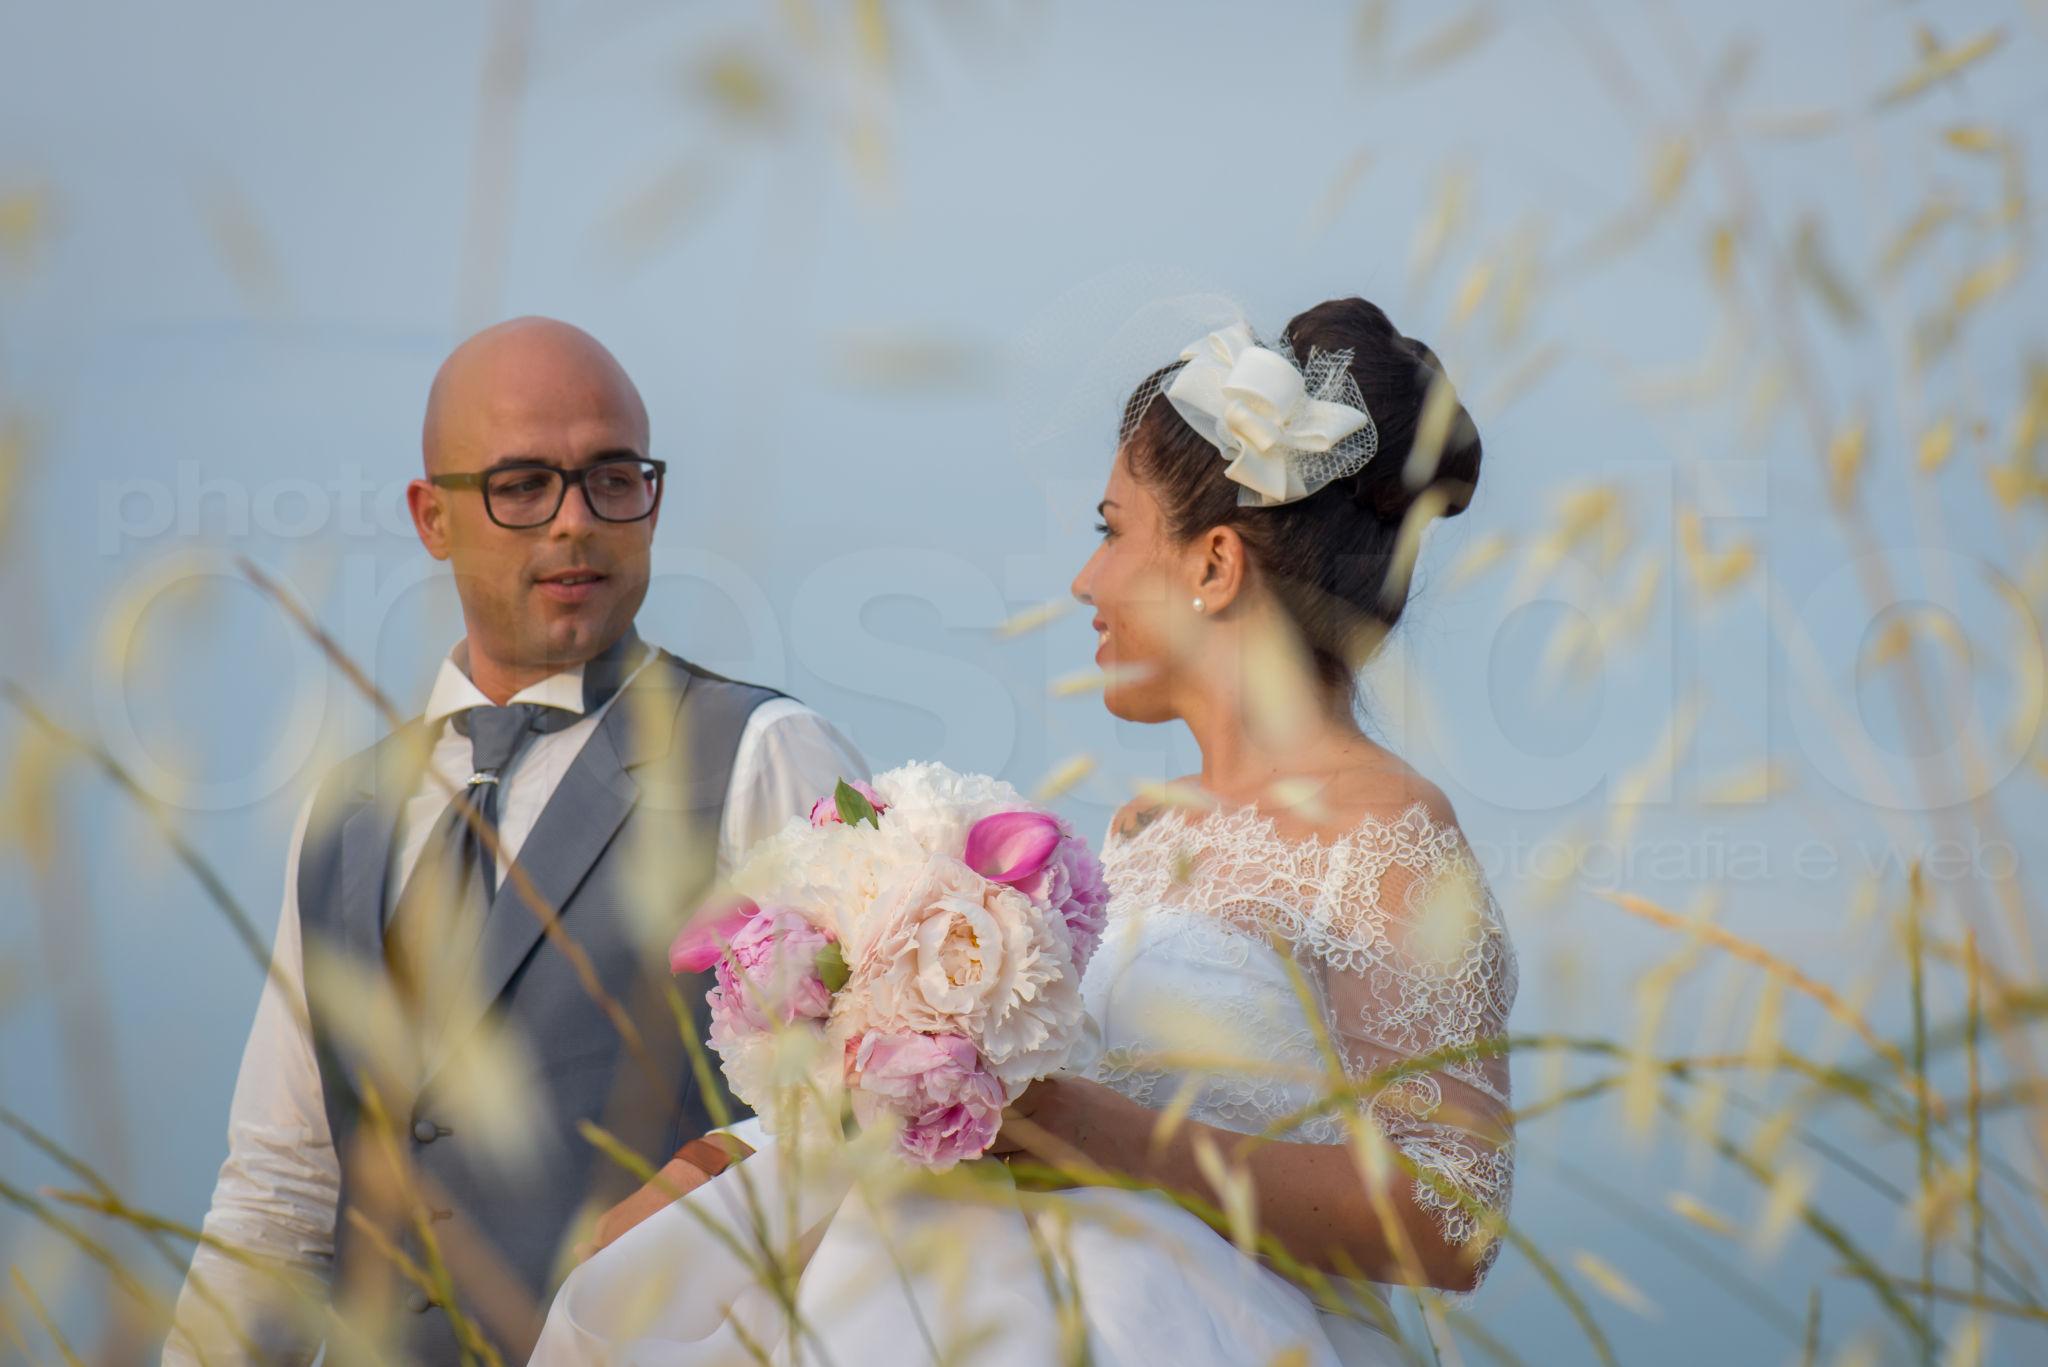 https://lnx.mirkone.it/wp-content/uploads/2015/07/fotografo-matrimoni-faenza-0007.jpg